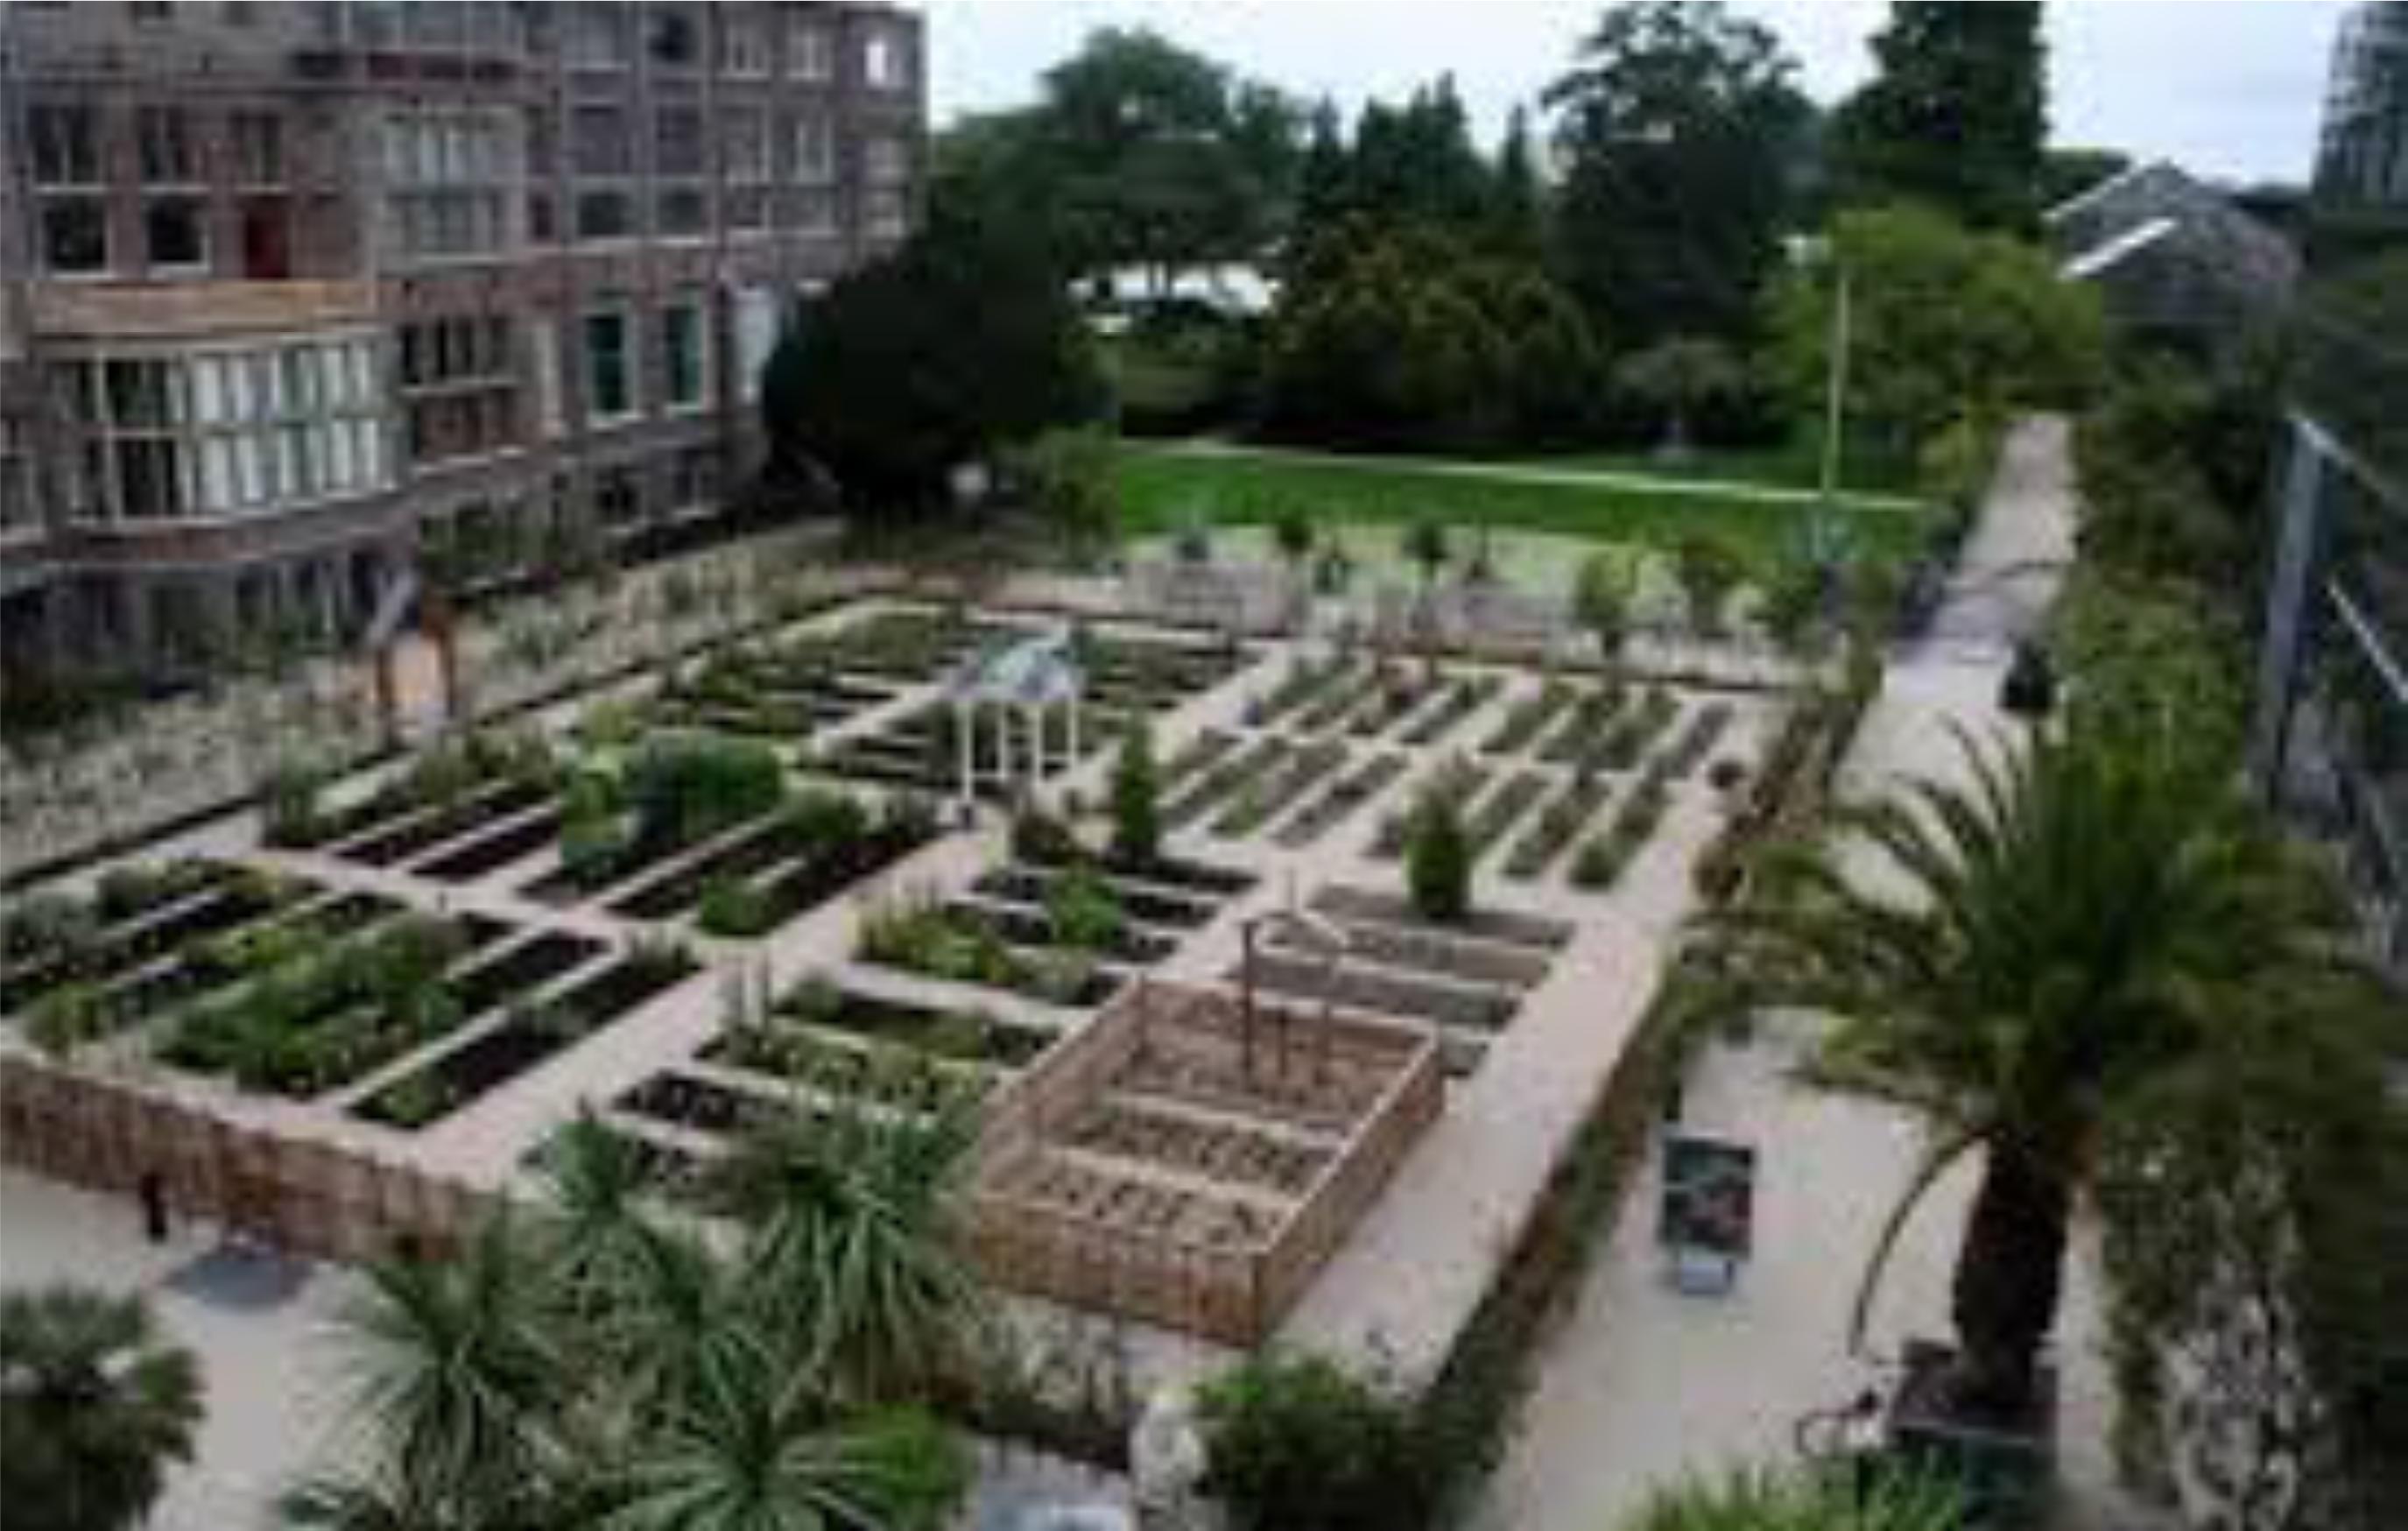 hortusGardens2 | BAGSC News